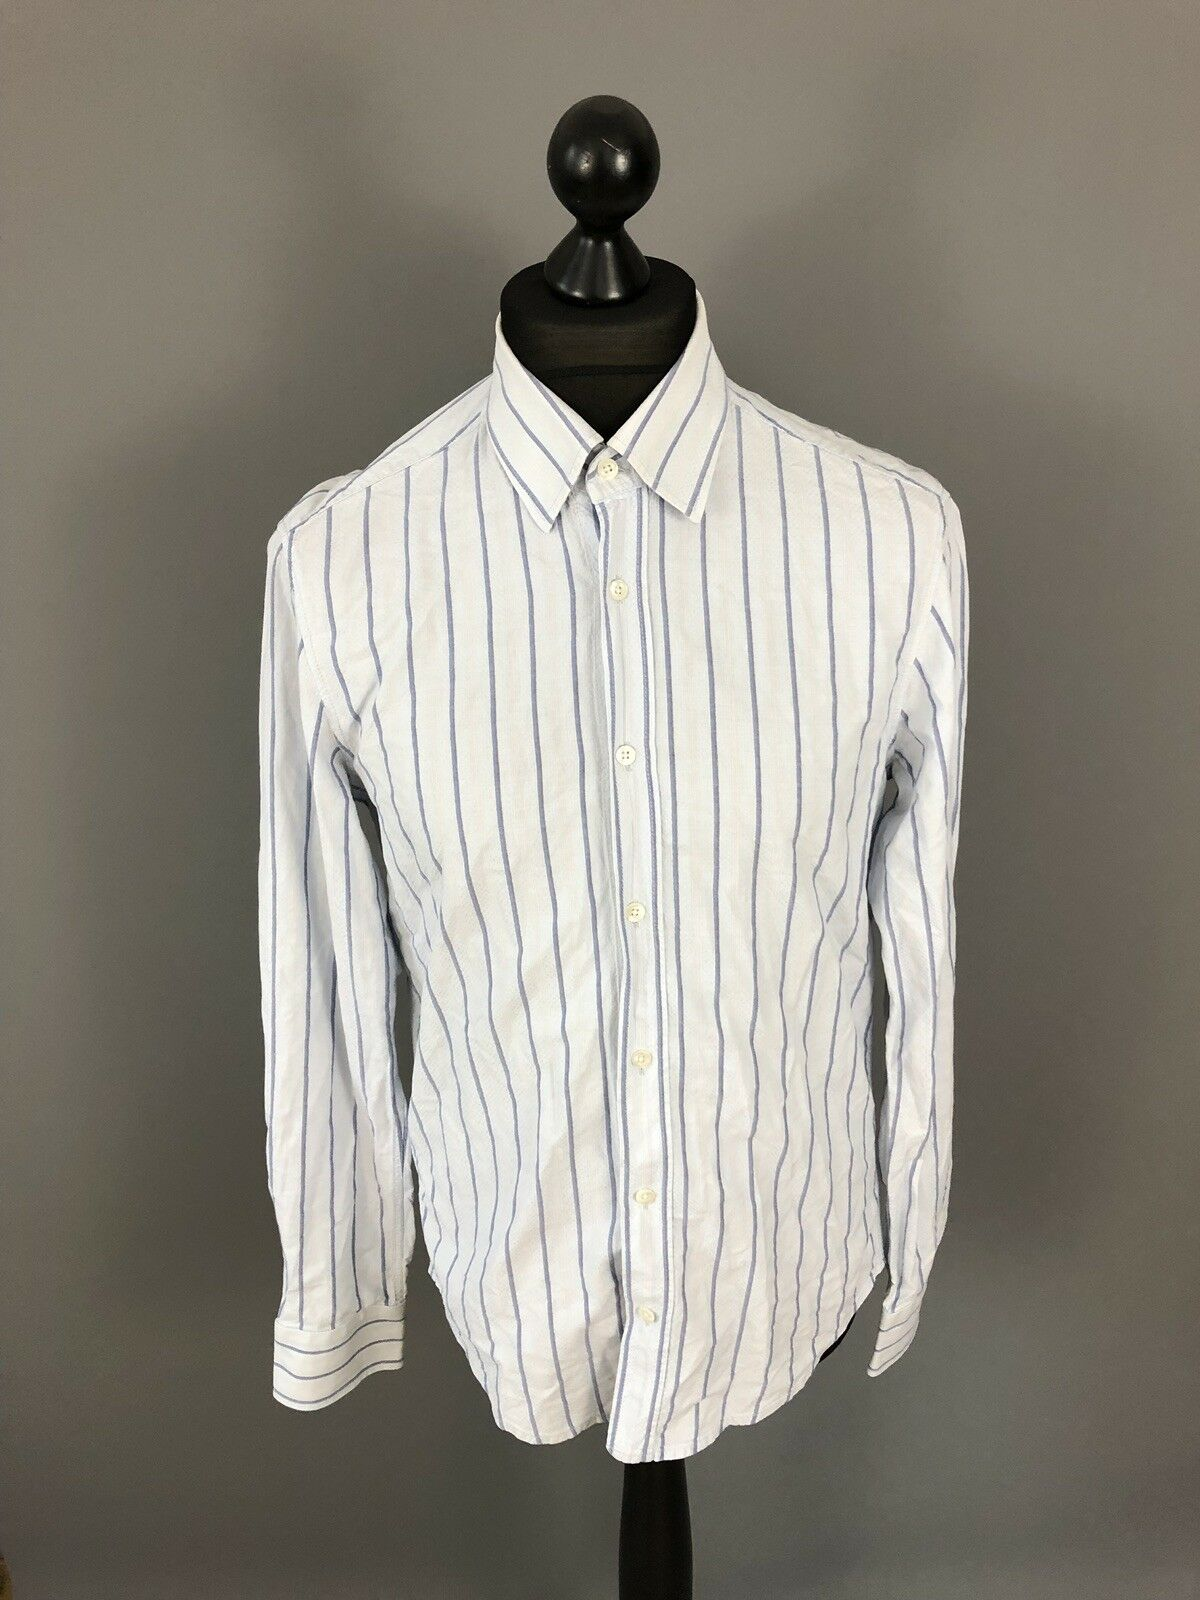 18d615ce3 HUGO BOSS Shirt - - Striped - Condition - Men's Medium Great ...